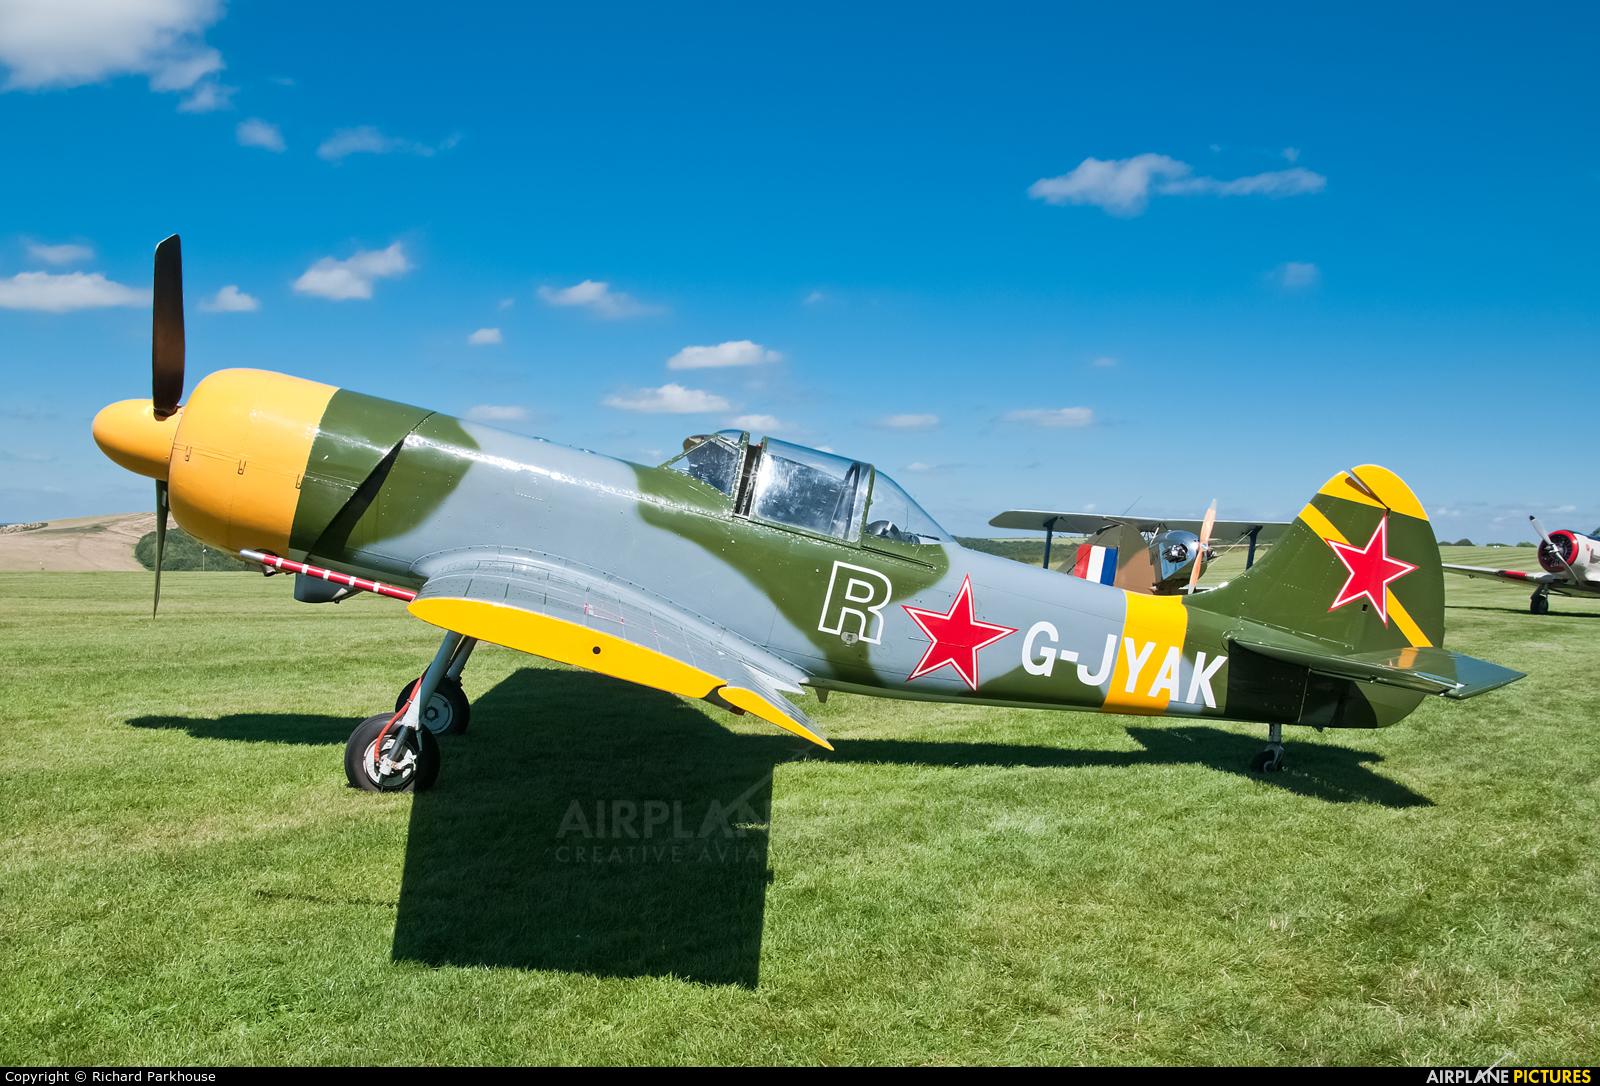 Private G-JYAK aircraft at Compton Abbas